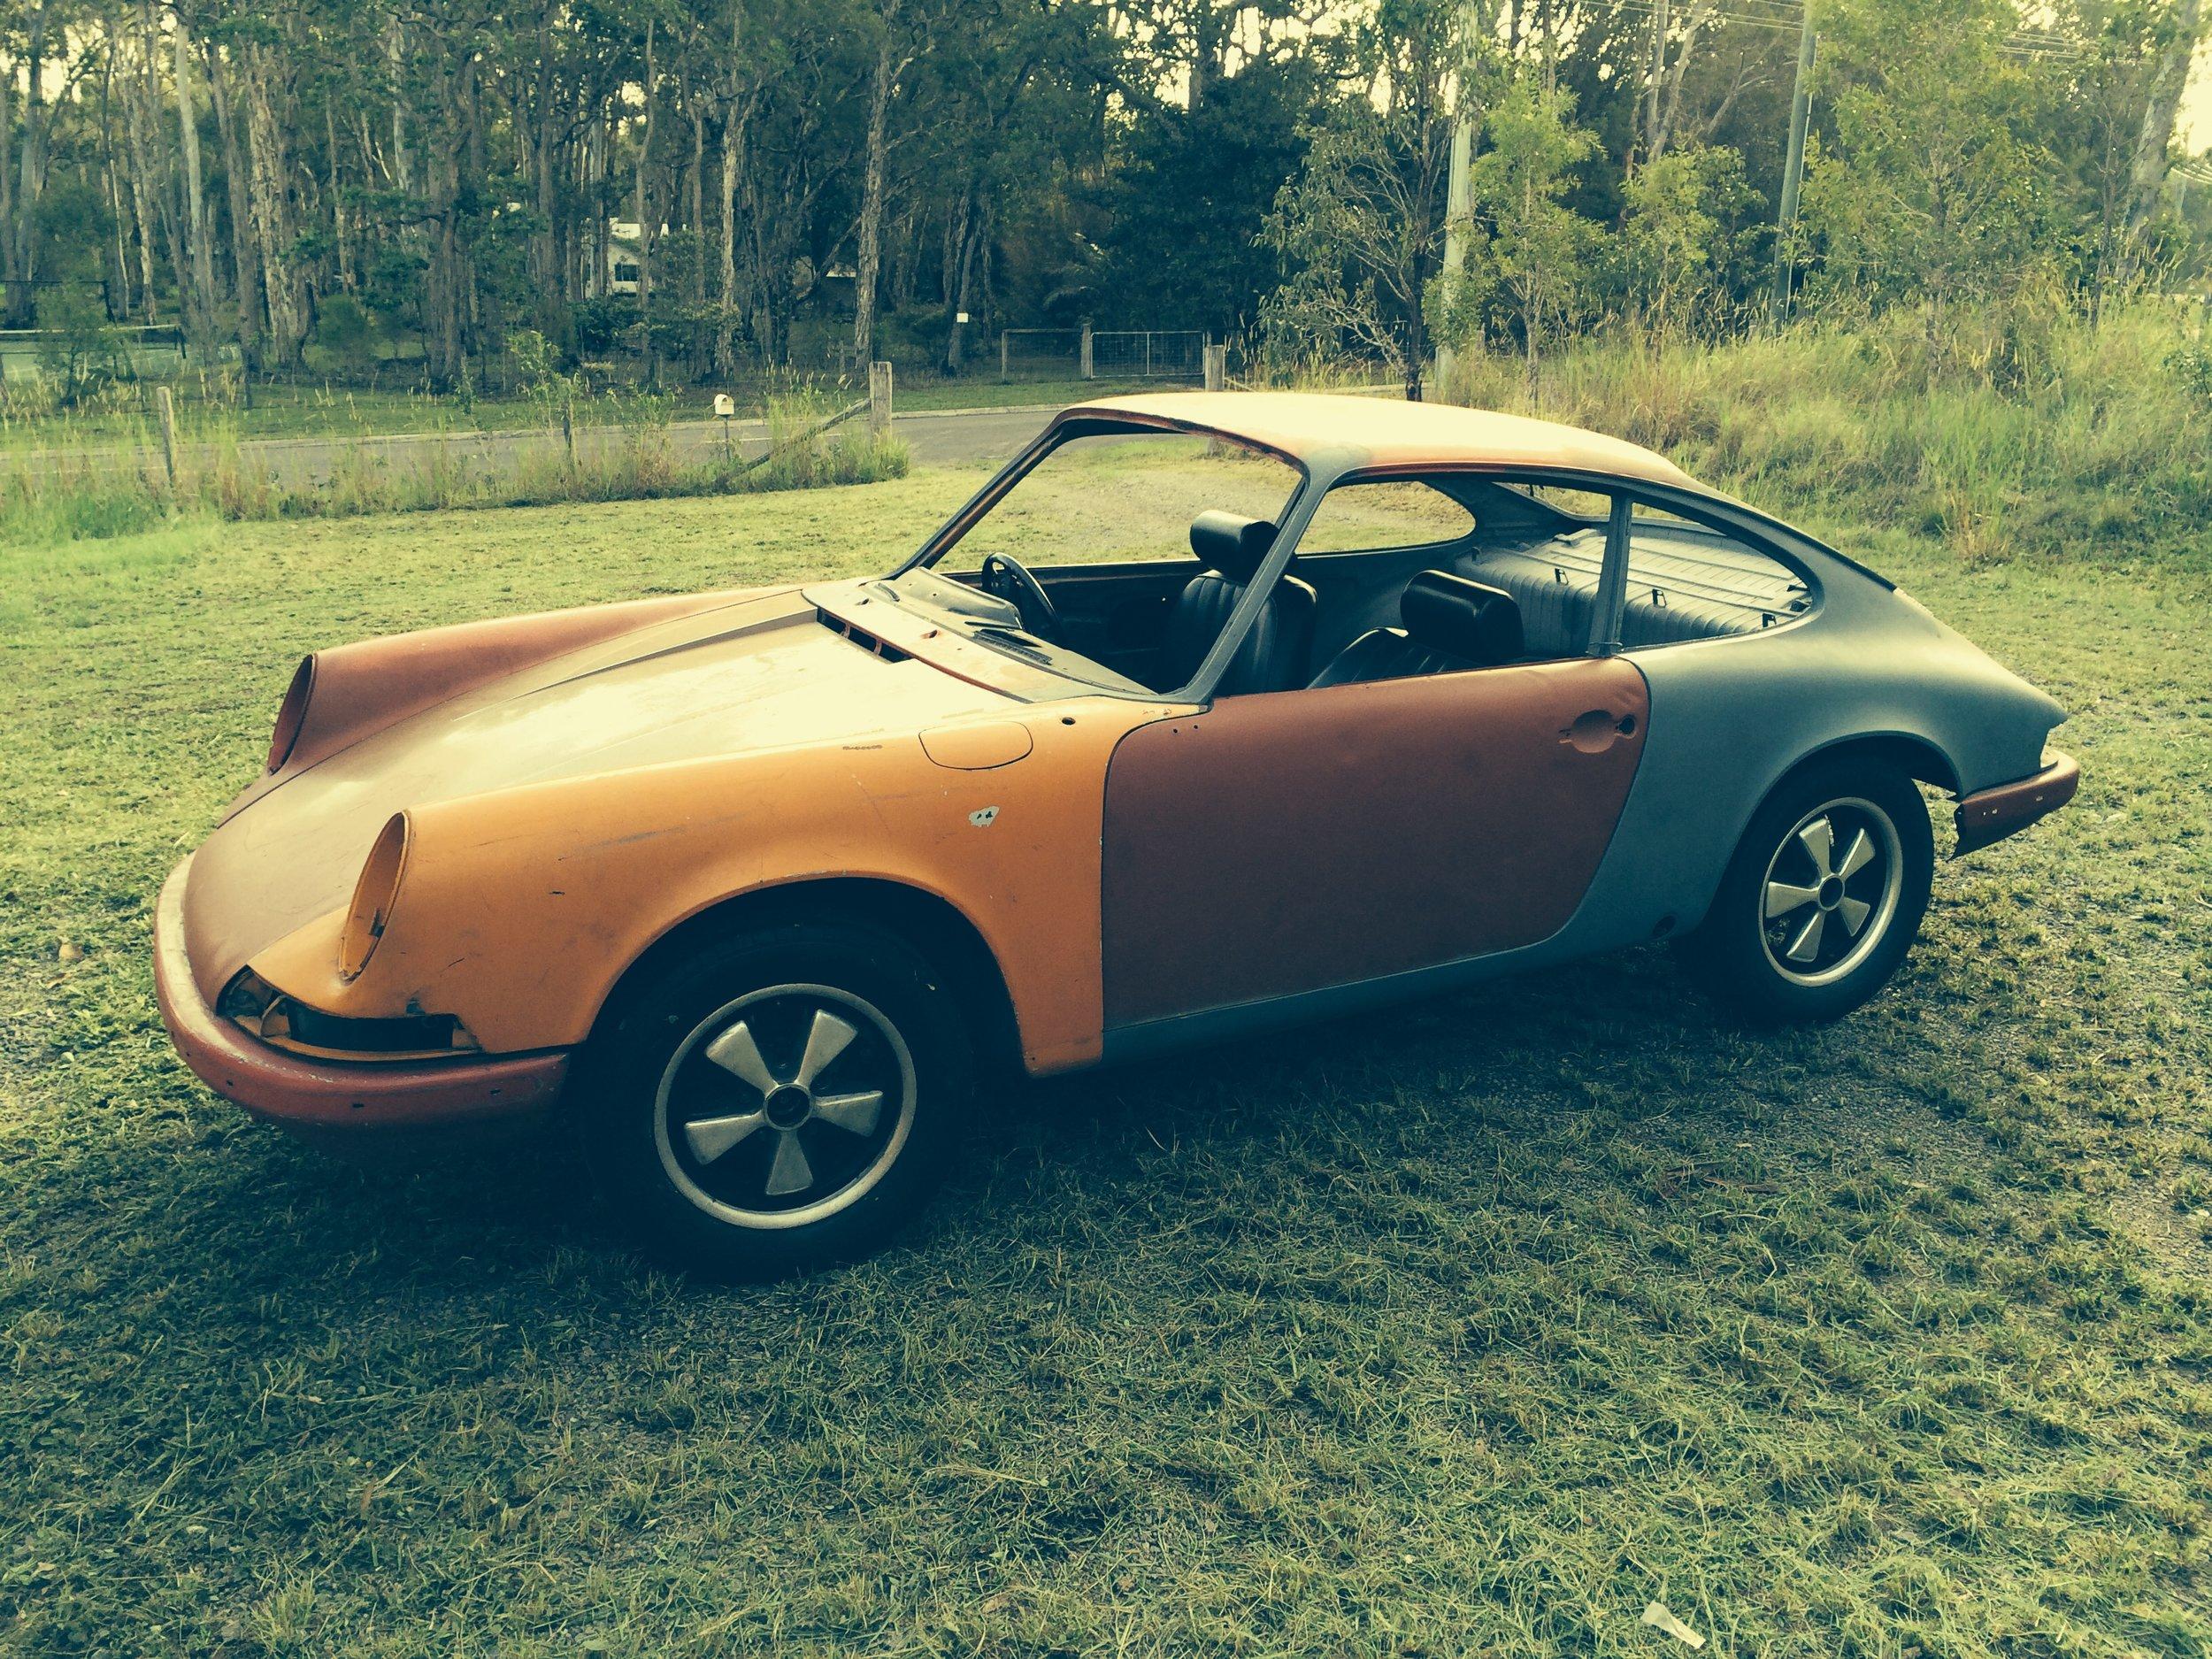 Porsche 911 restoration project